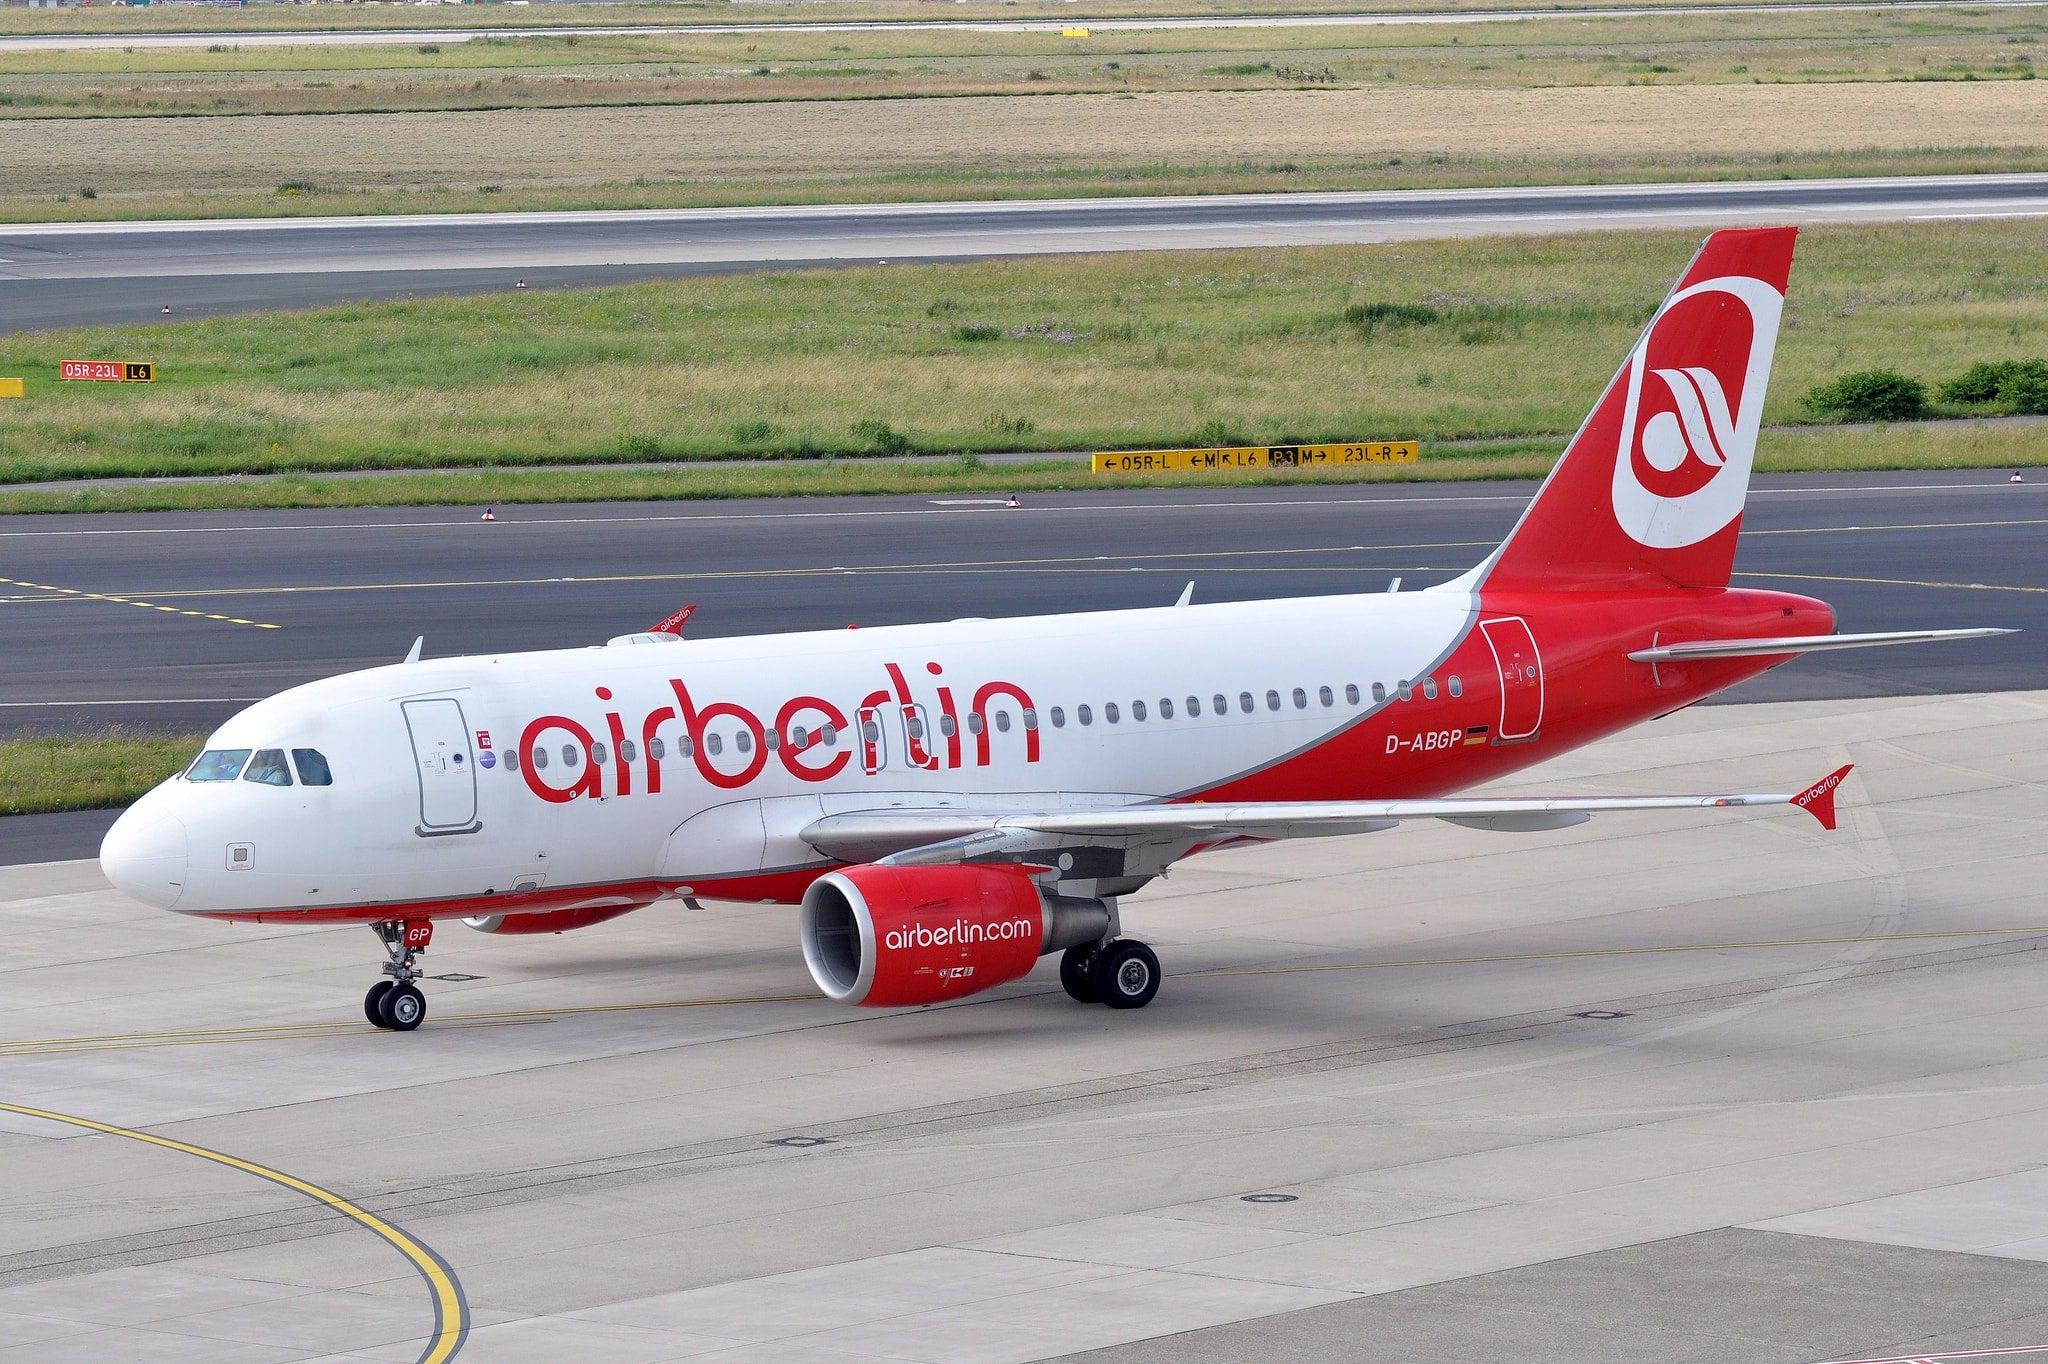 aereo air berlin check in online edreams blog di viaggi